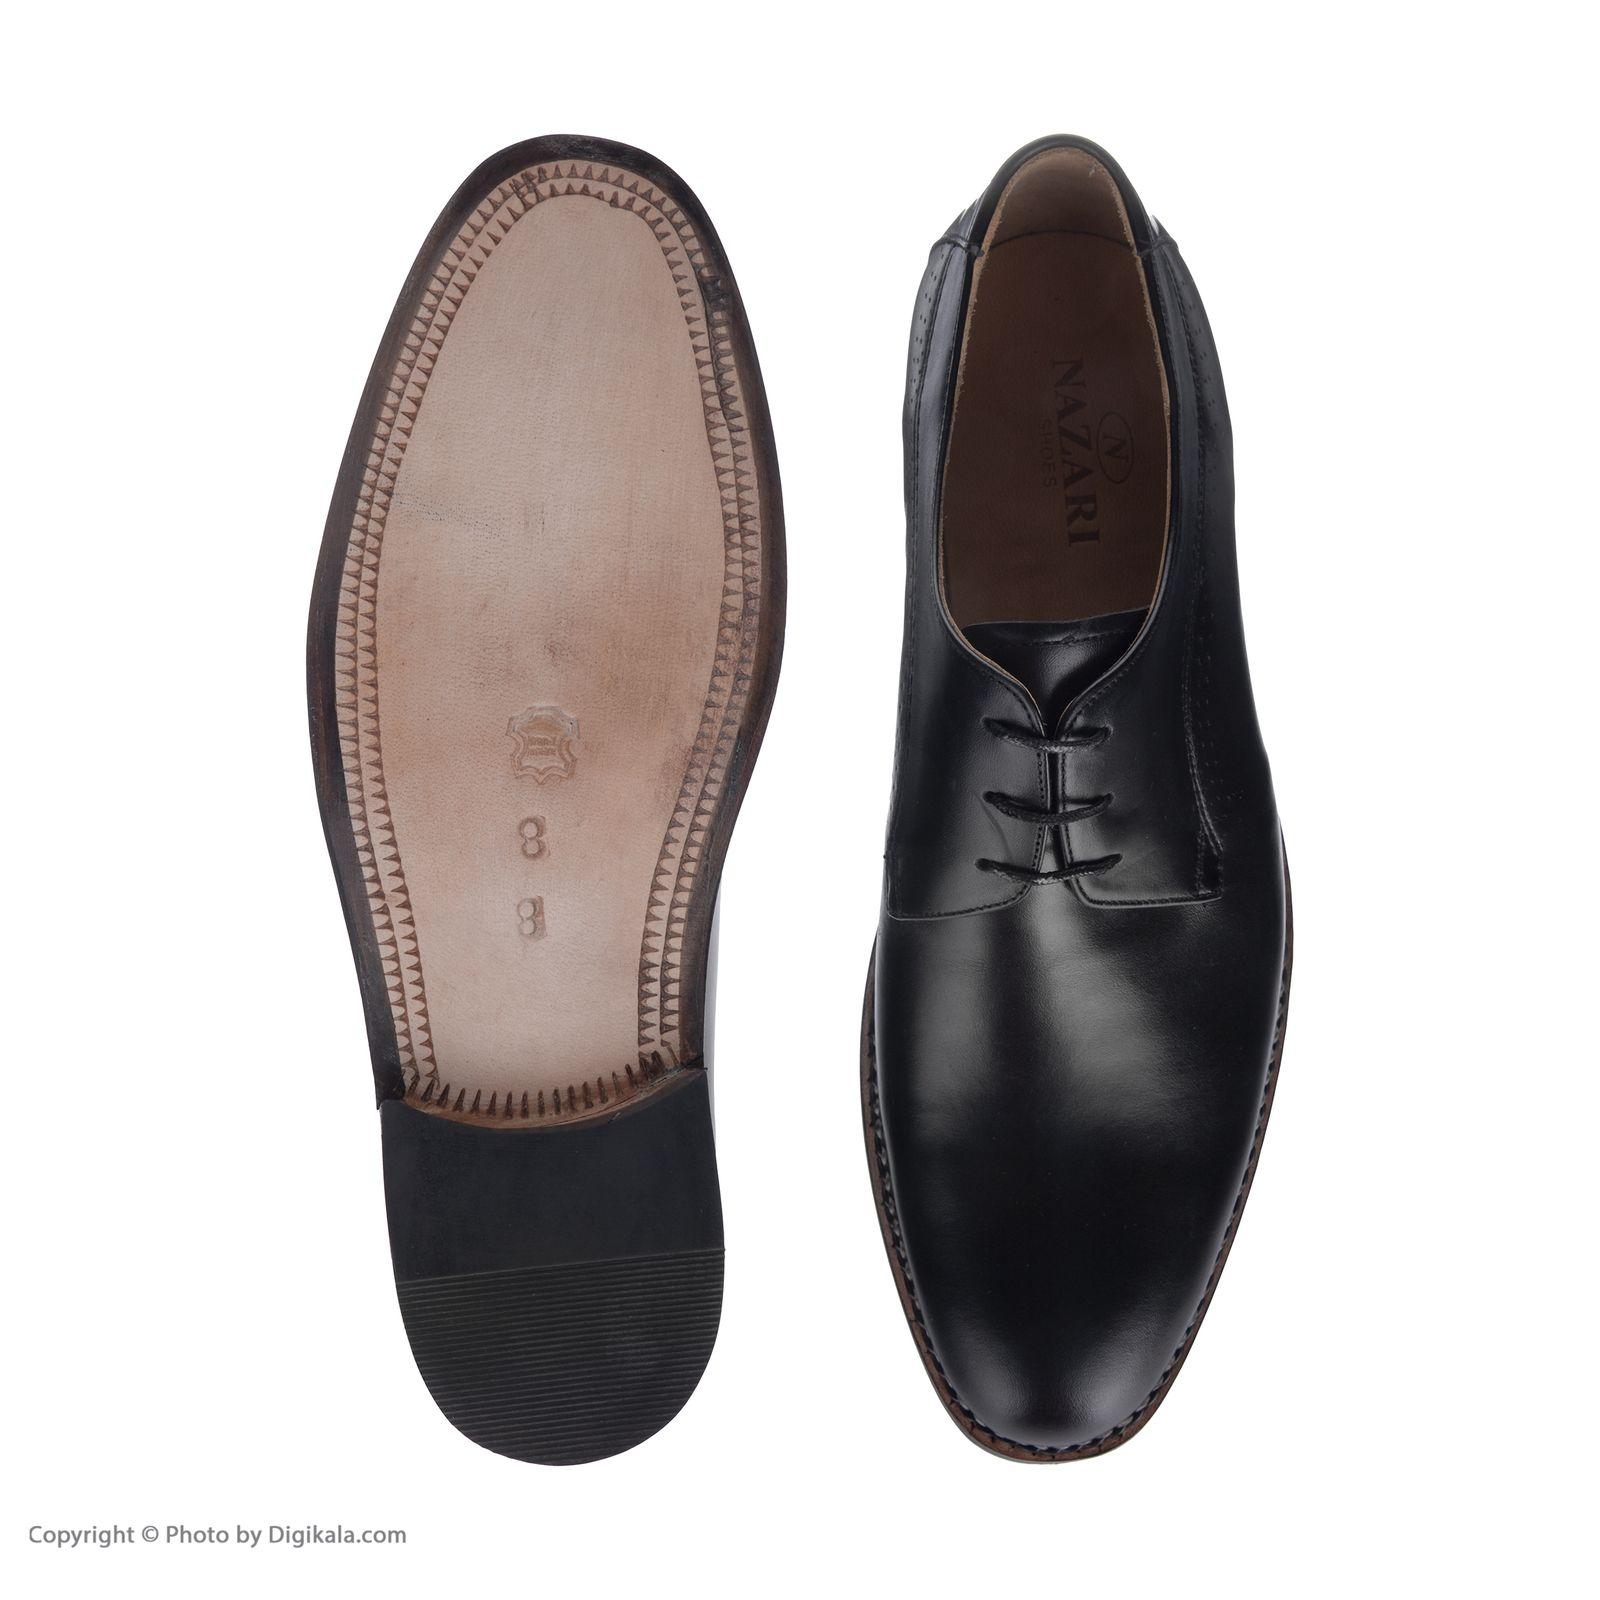 کفش مردانه نظری کد 405 -  - 3